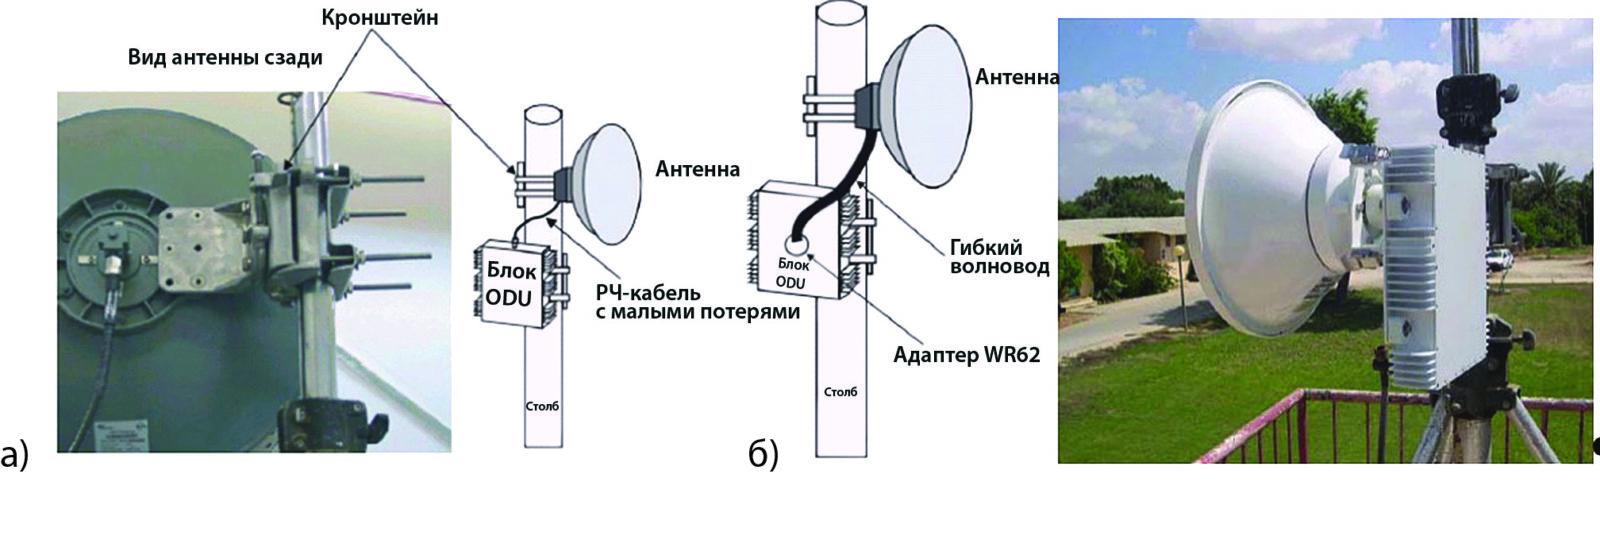 Раздельная установка блока ODU; диапазон 7/8/11 ГГц диапазон 13/15/18 ГГц (а) и установка блока ODU на антенне Andrew (б)